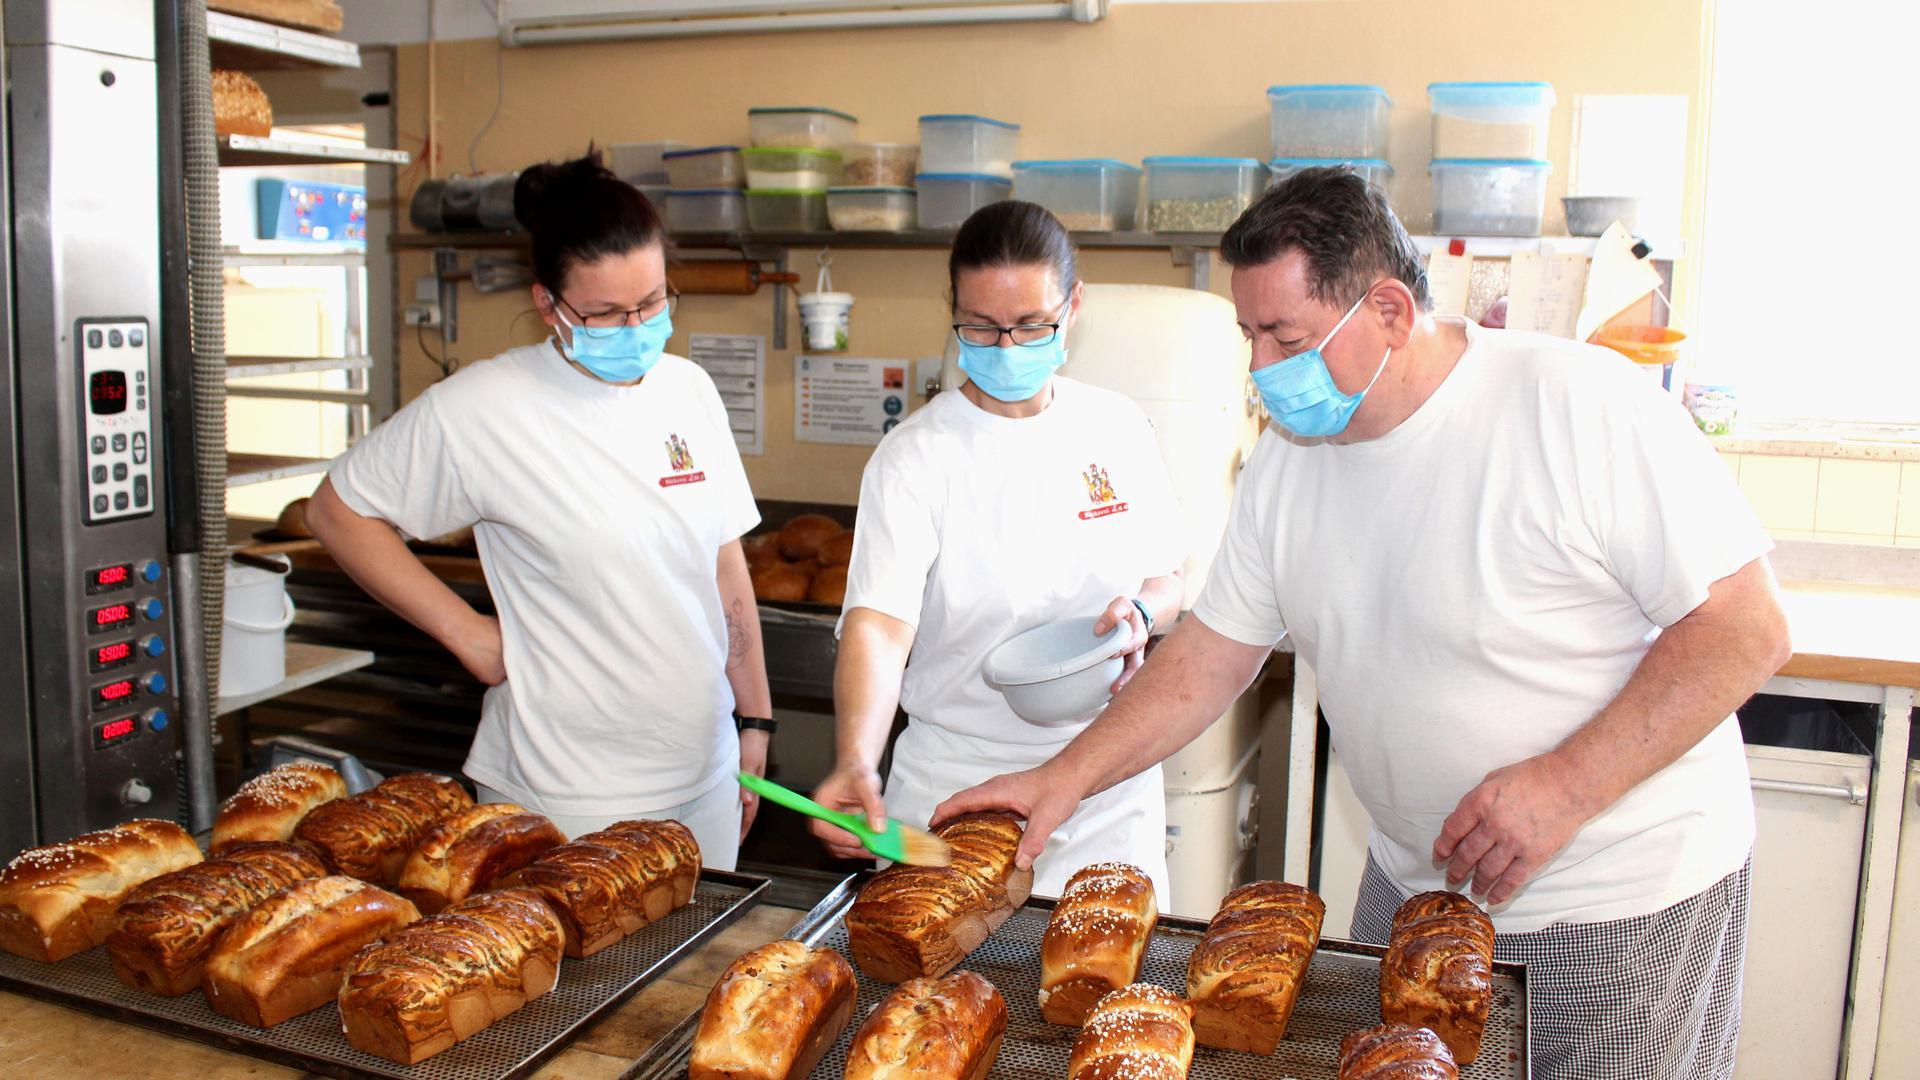 Bäckereibackstube